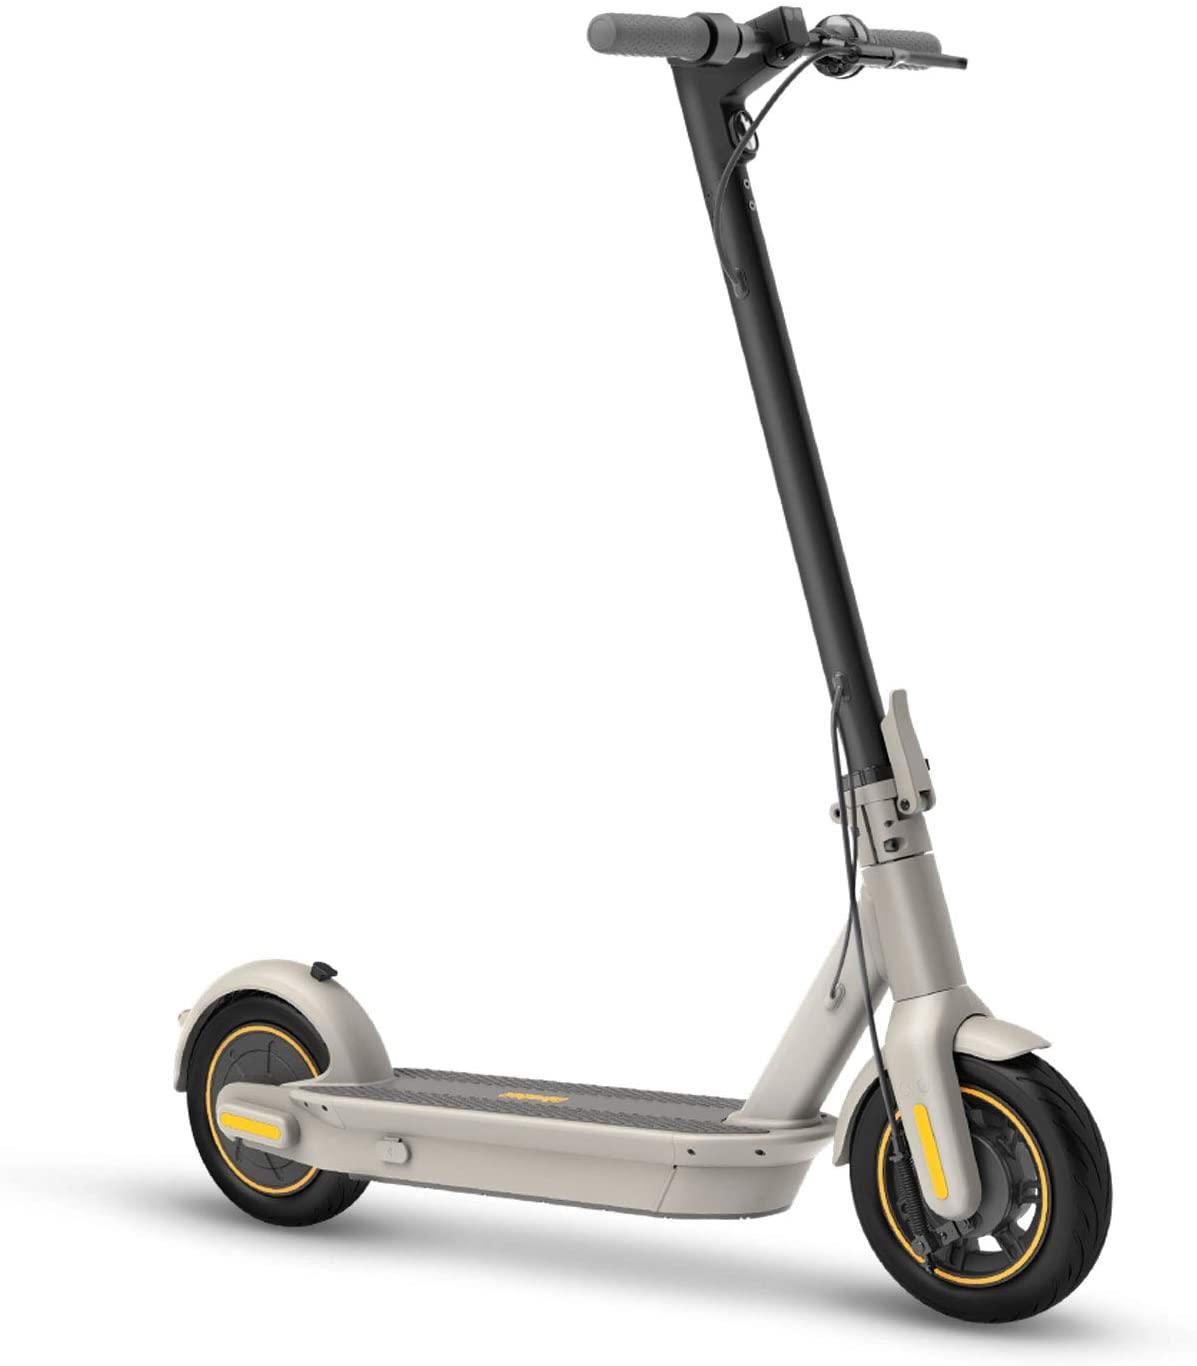 electric-g30lp-long-range-foldable-portable